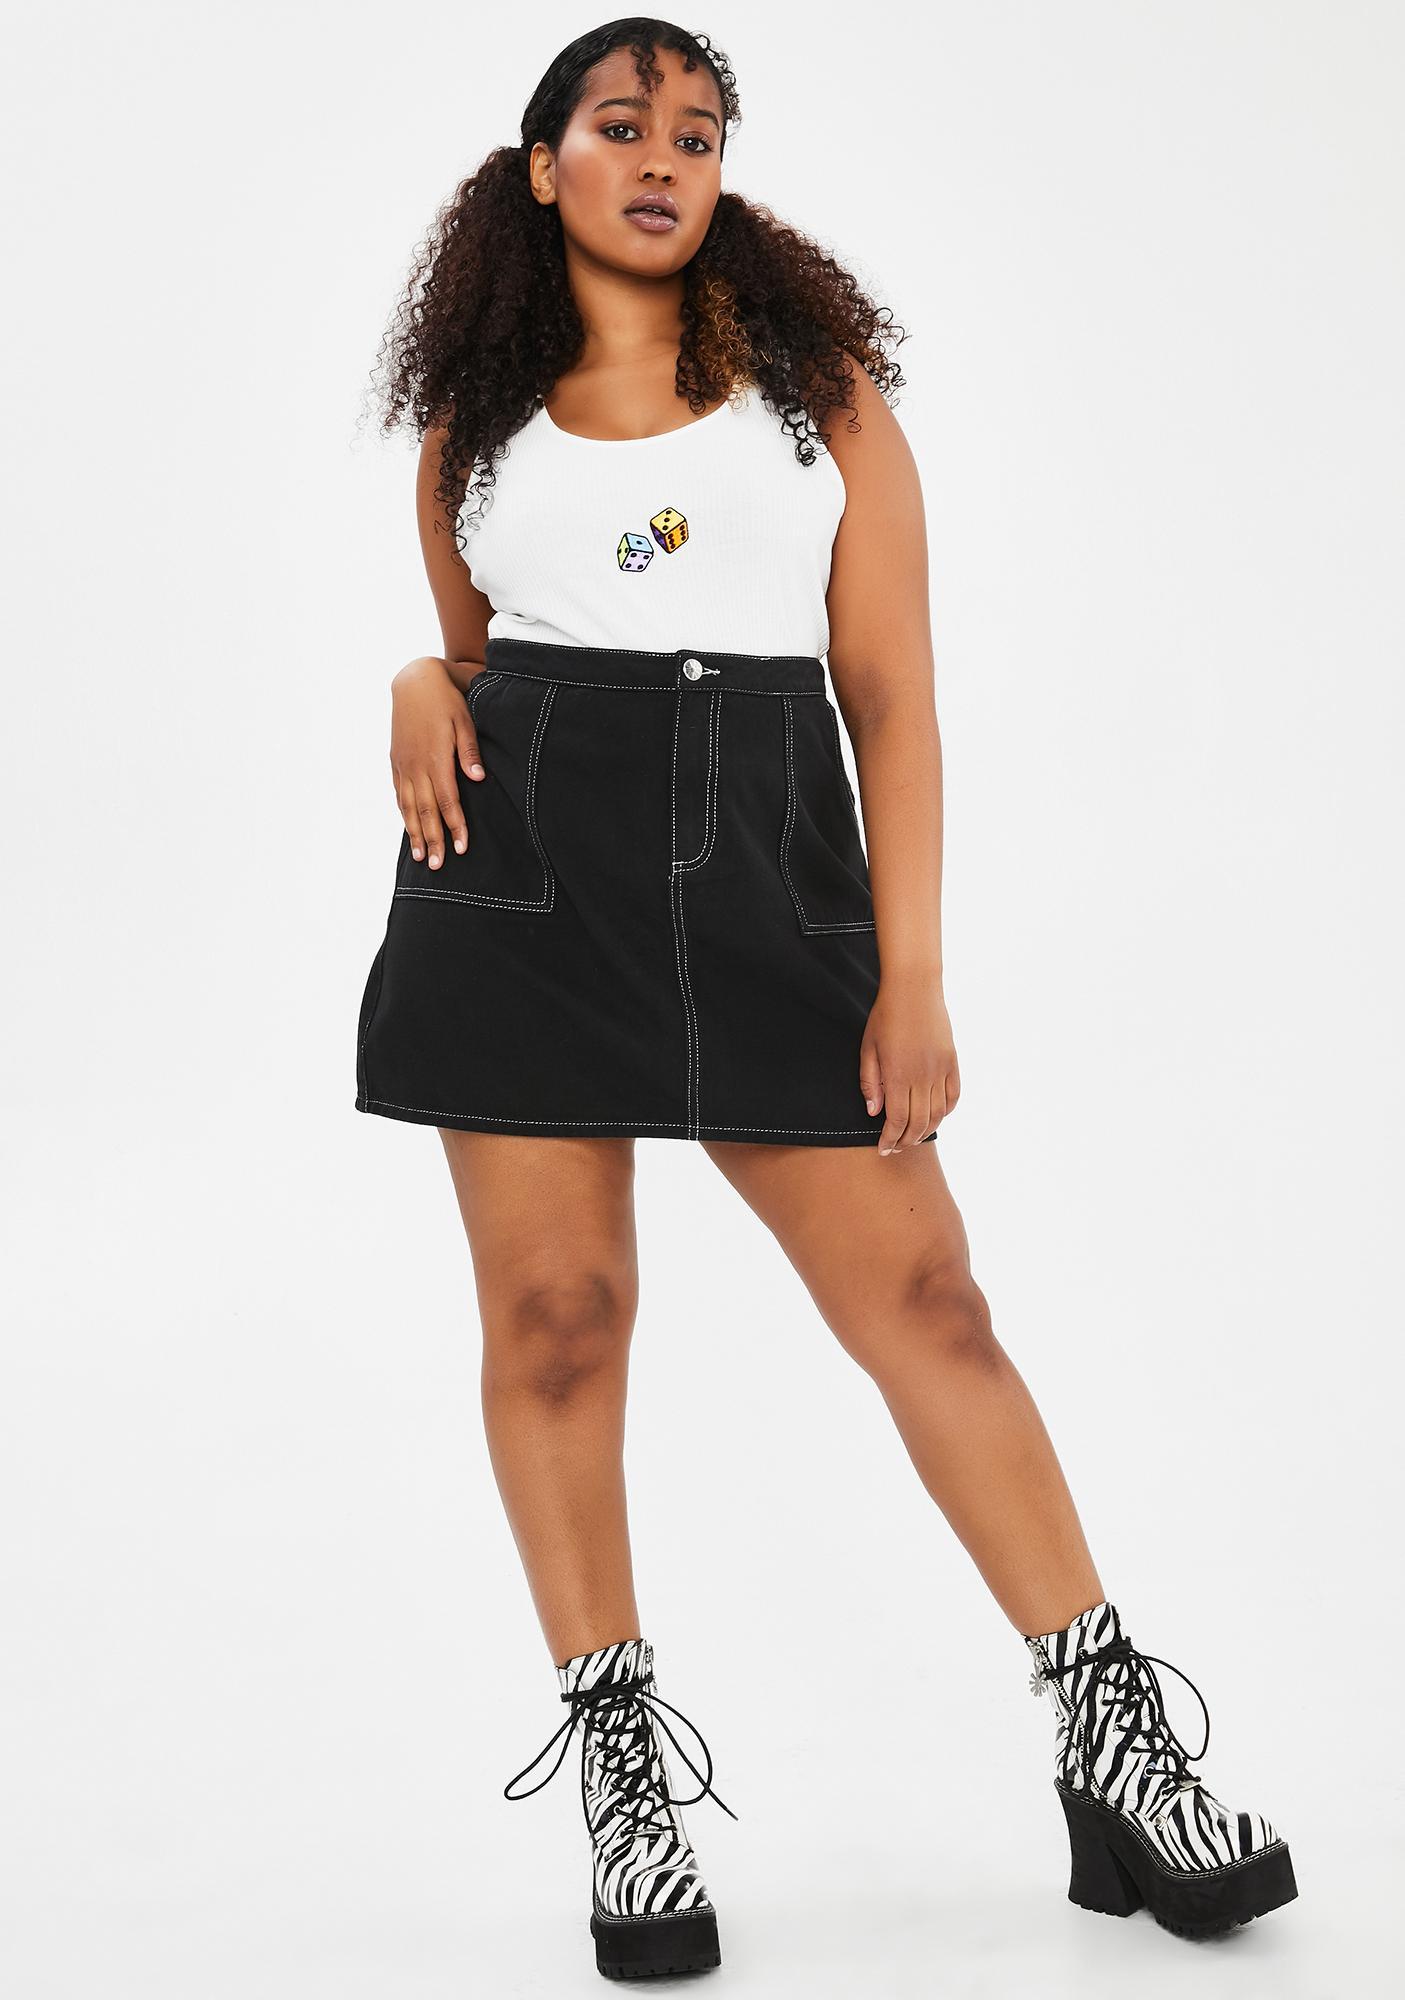 dELiA*s by Dolls Kill Miss Flirting With Trouble Mini Skirt